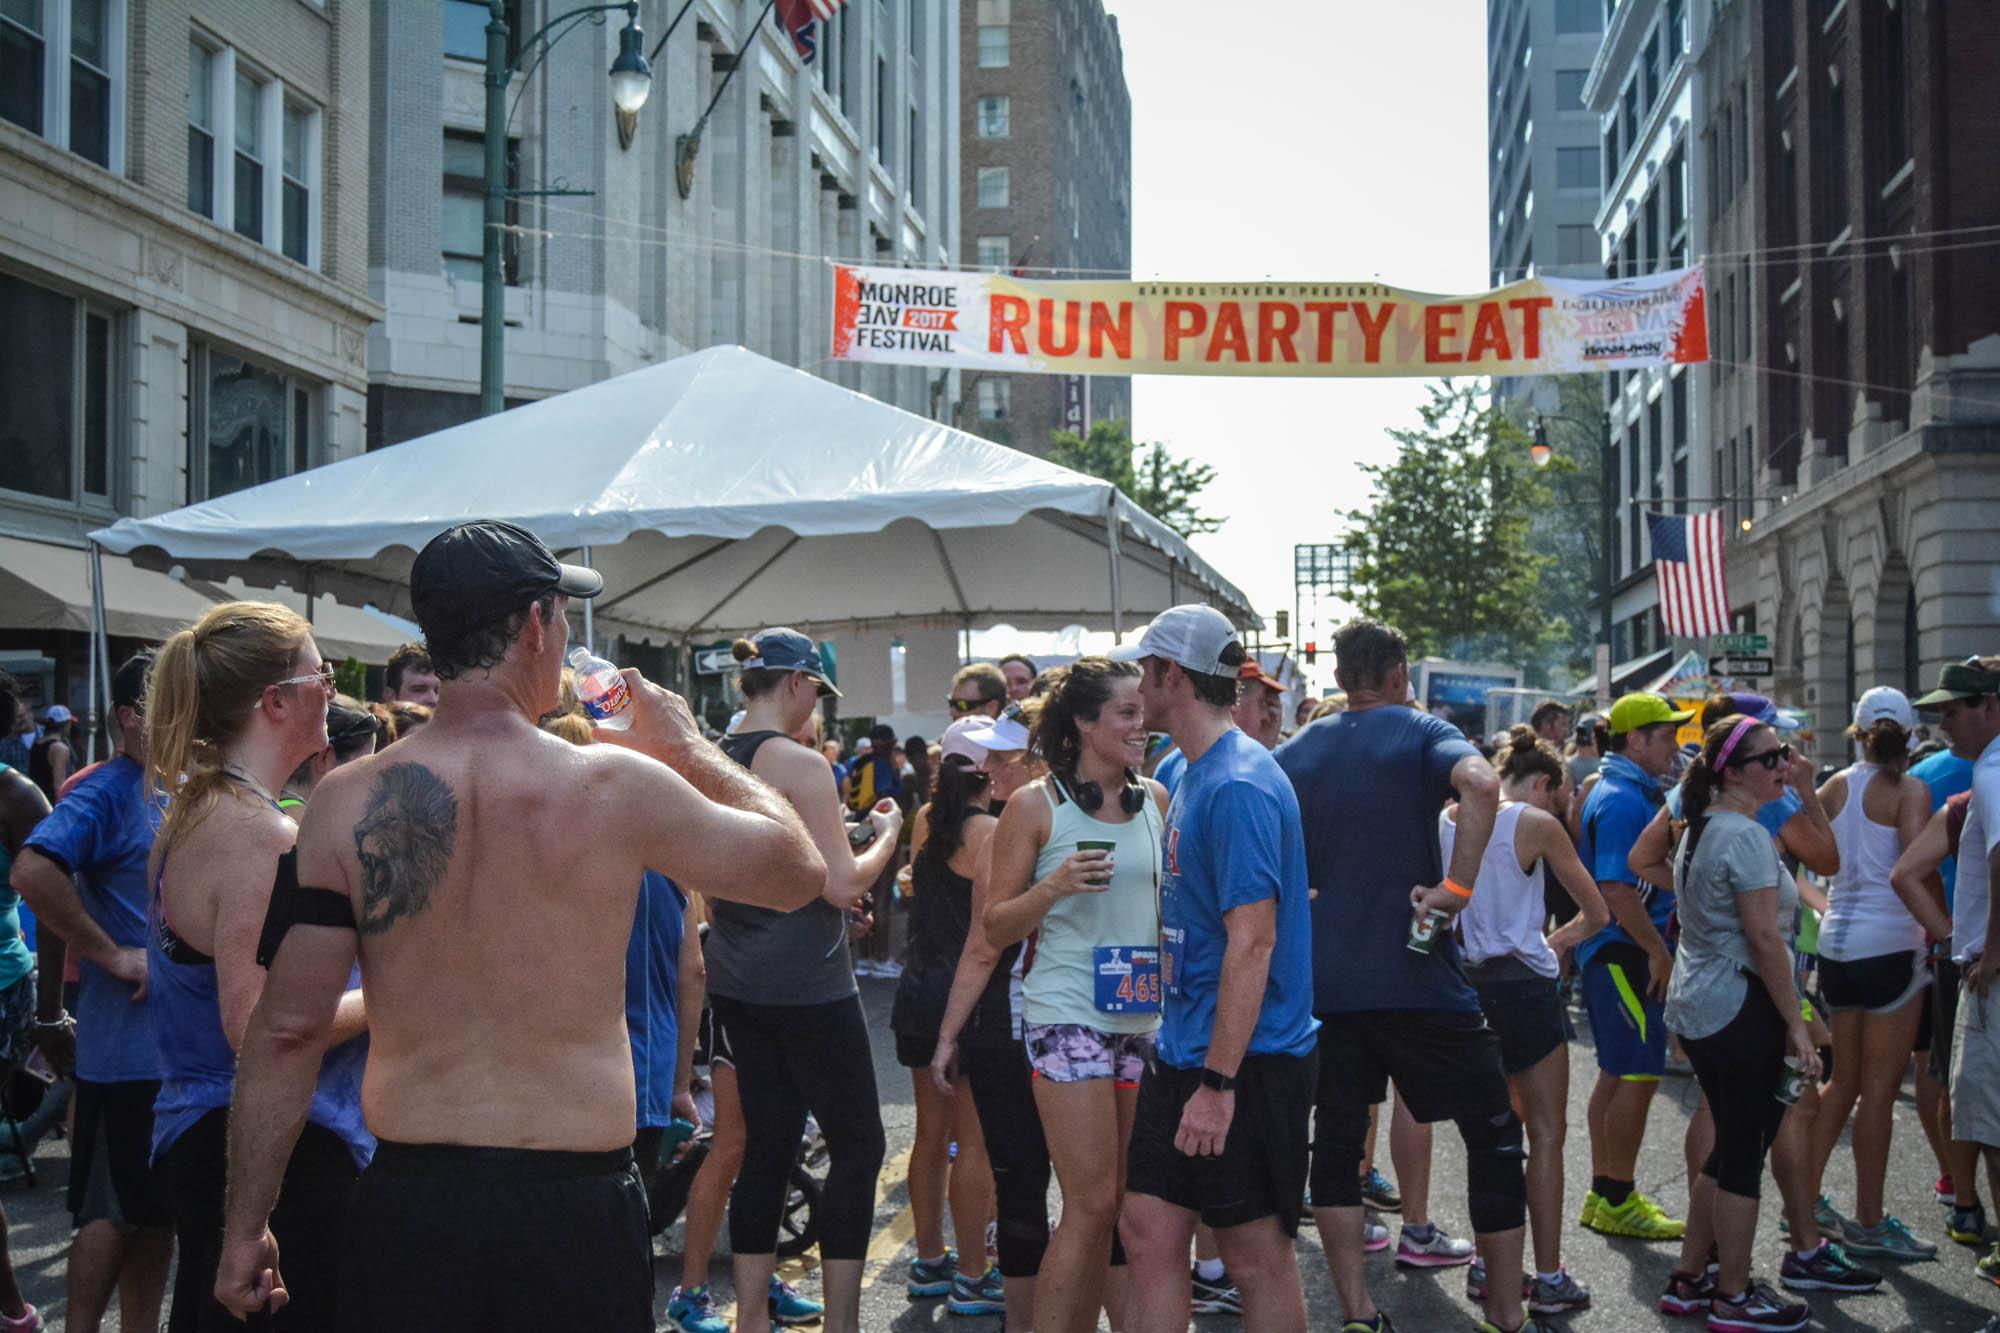 Run, Party, Eat